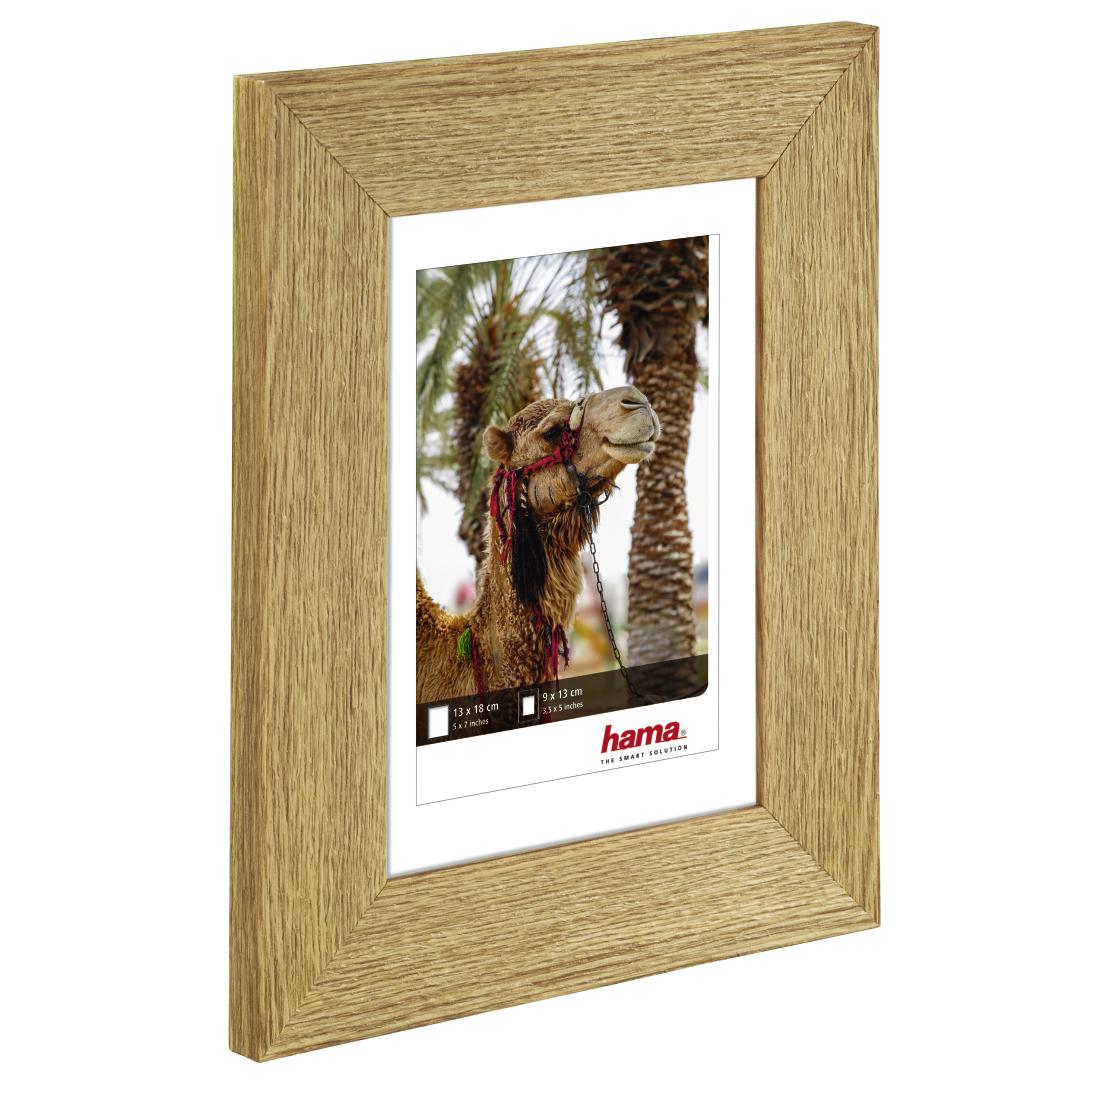 00125954 Hama Cairo Plastic Frame Ash 20 X 30 Cm Hama De